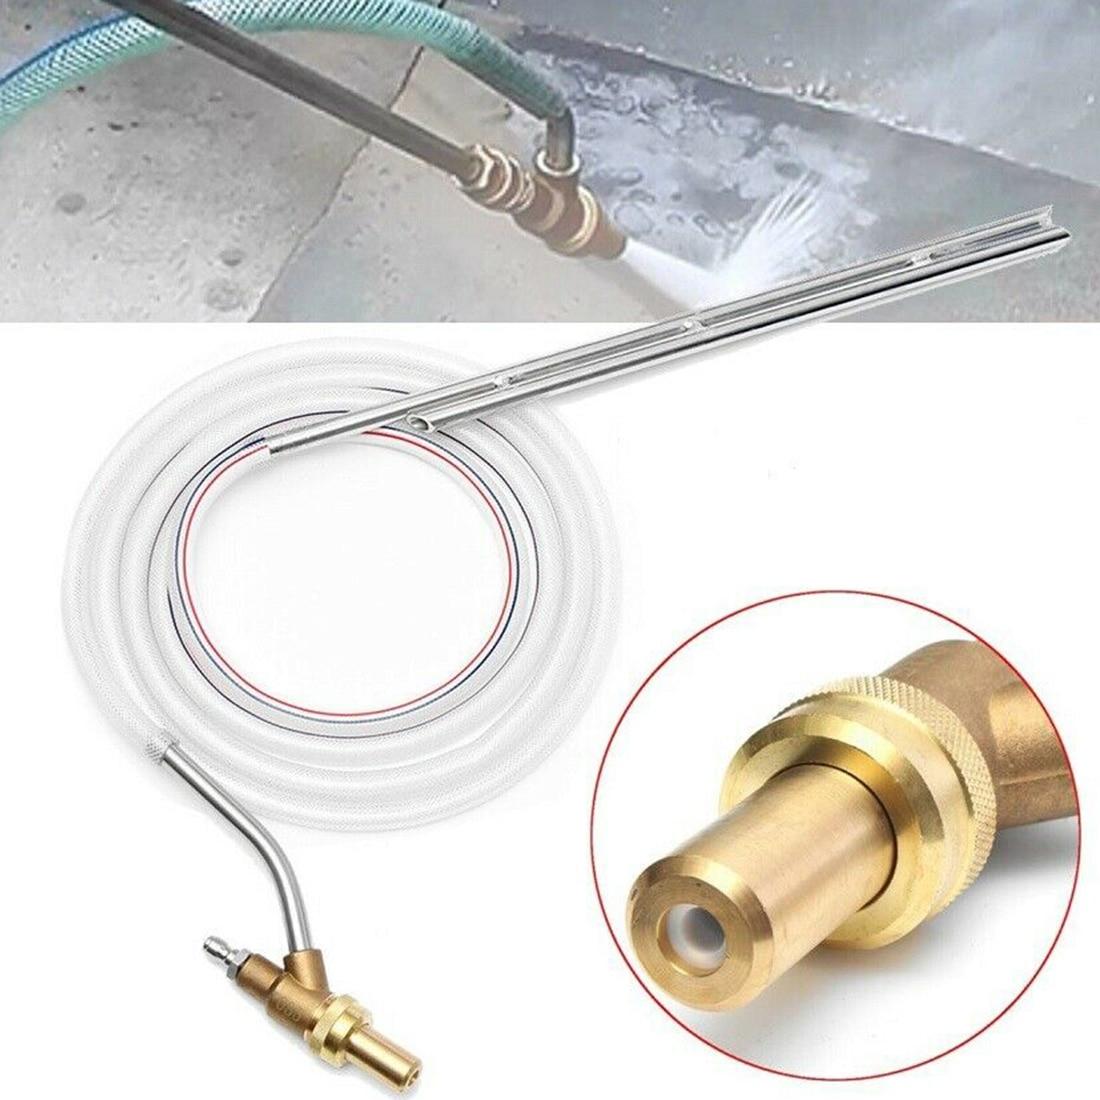 Portable Sand Blaster Wet Blasting Washer Sandblasting Kit For Karcher Series High Pressure Washers Blasting Gun Lance Spear